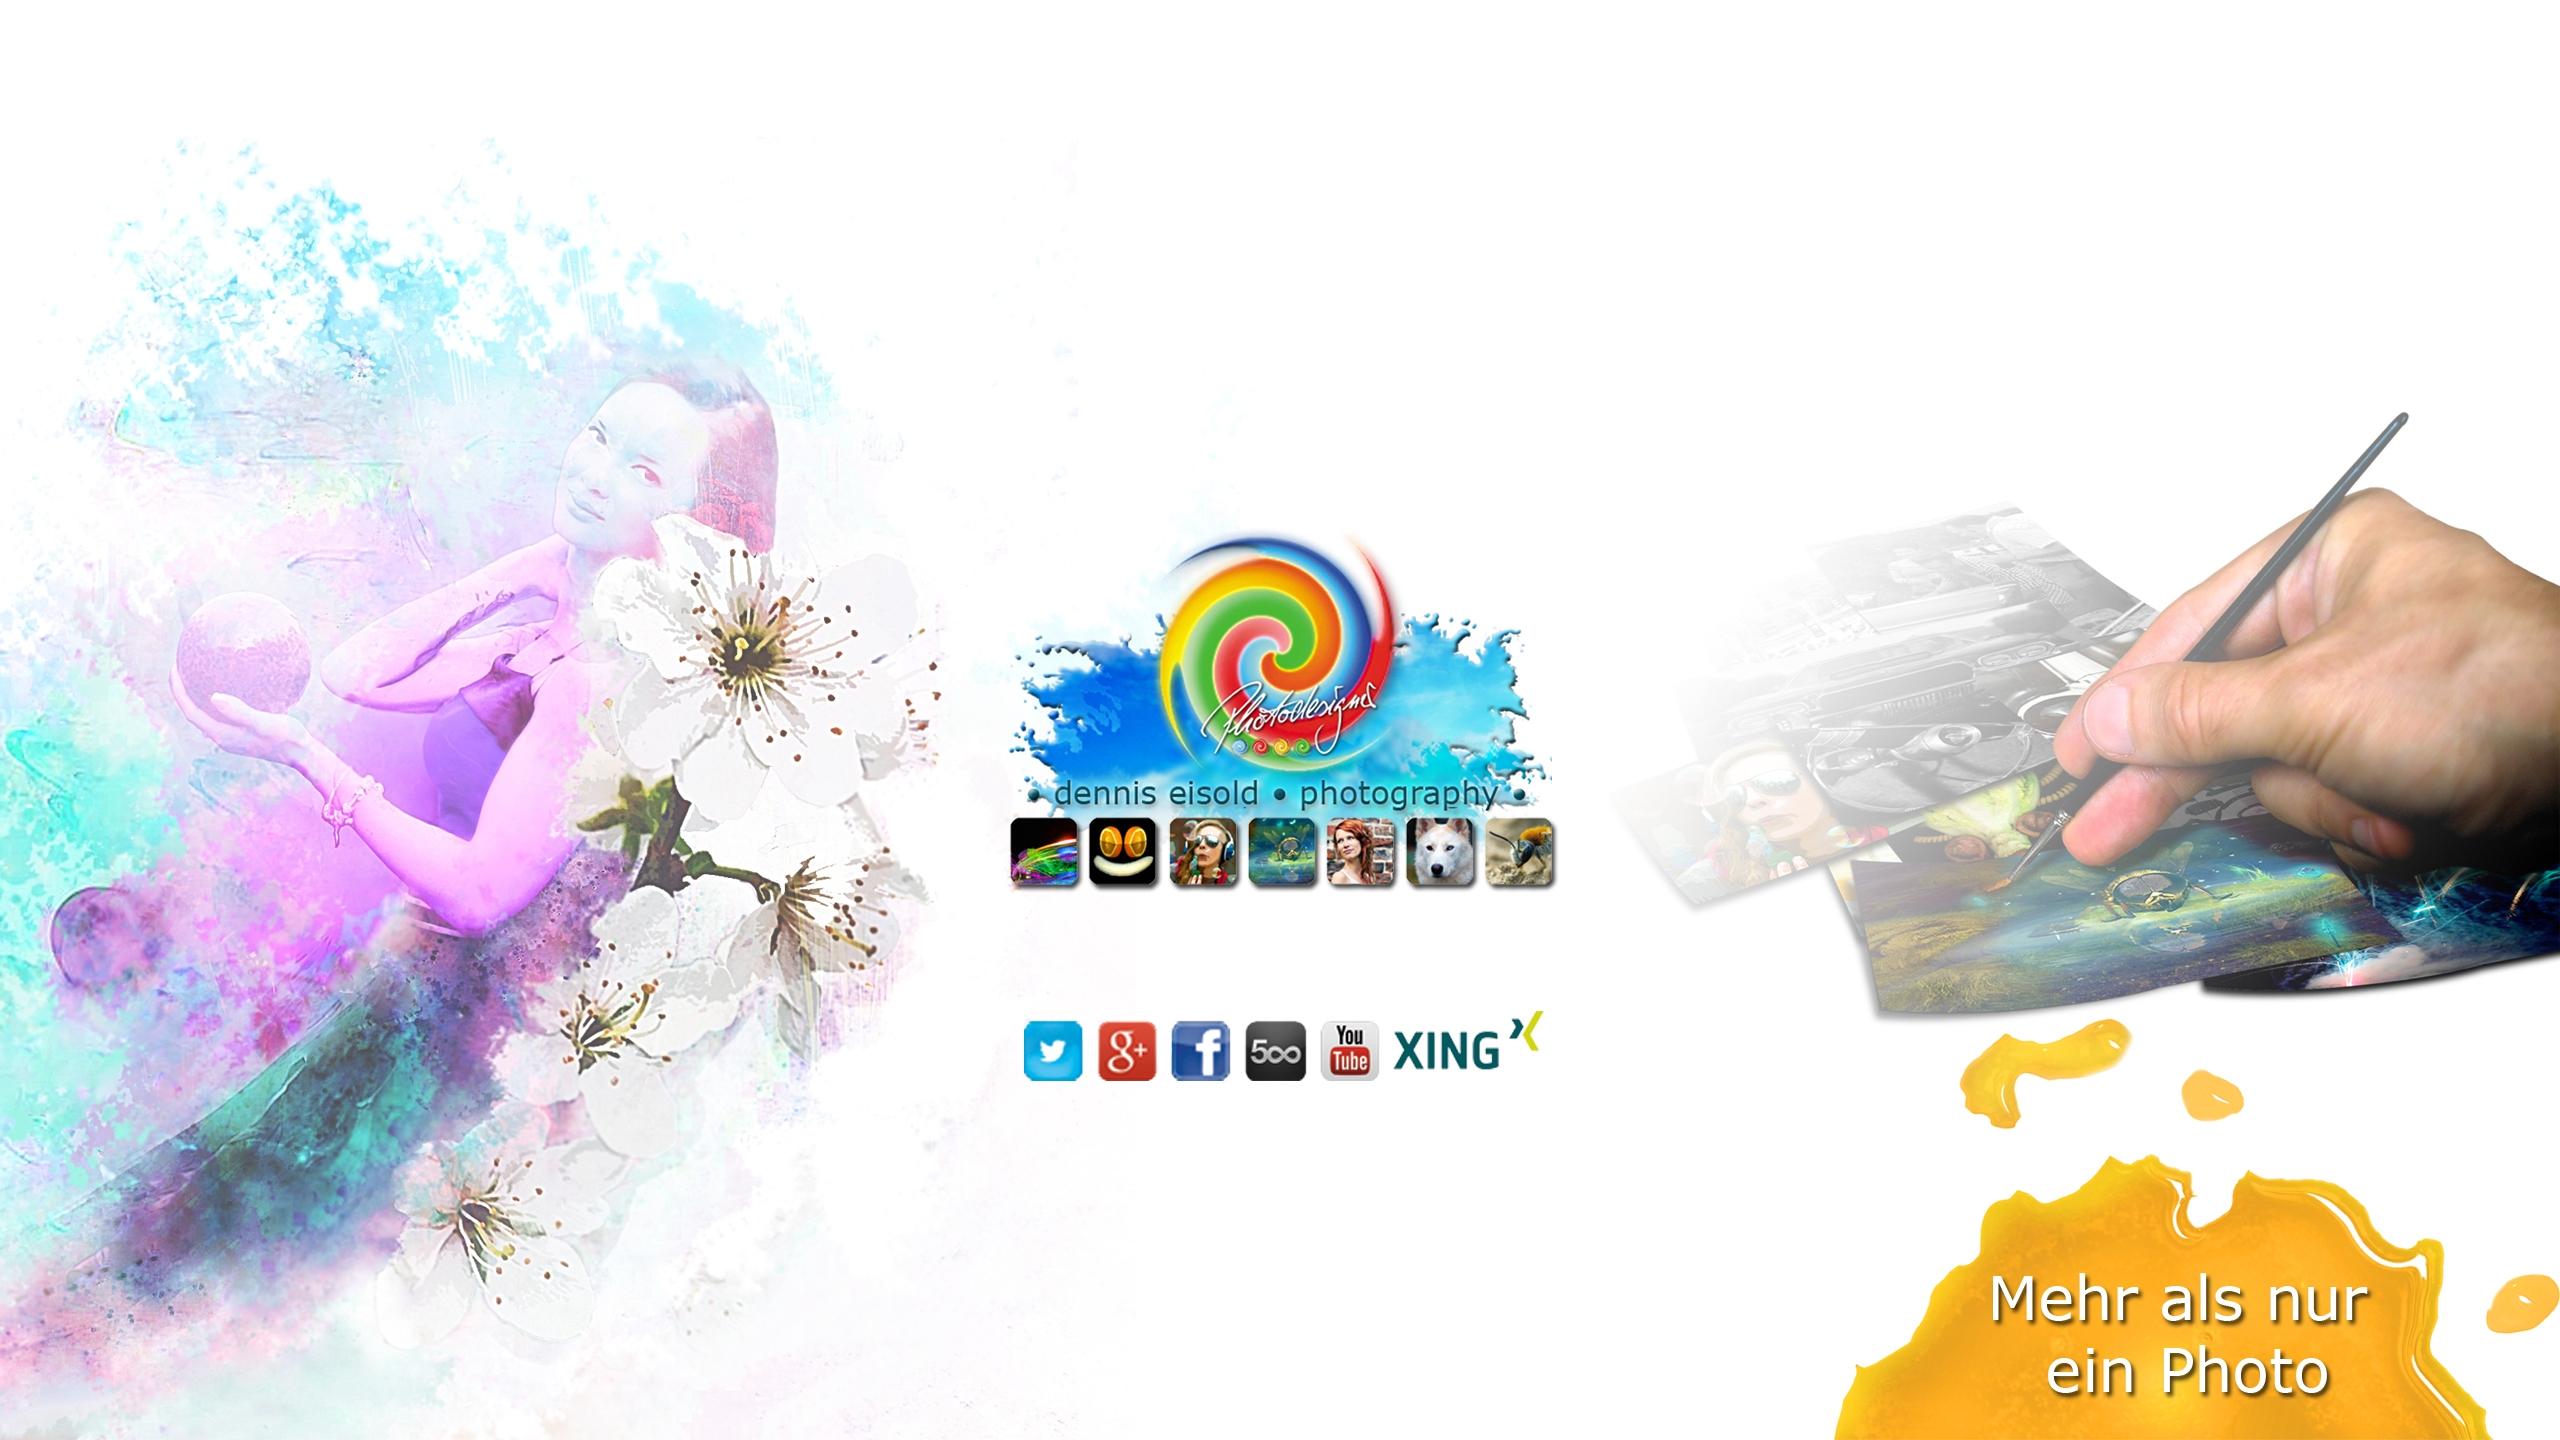 deisold-photodesign (@deisold_photodesign) Cover Image